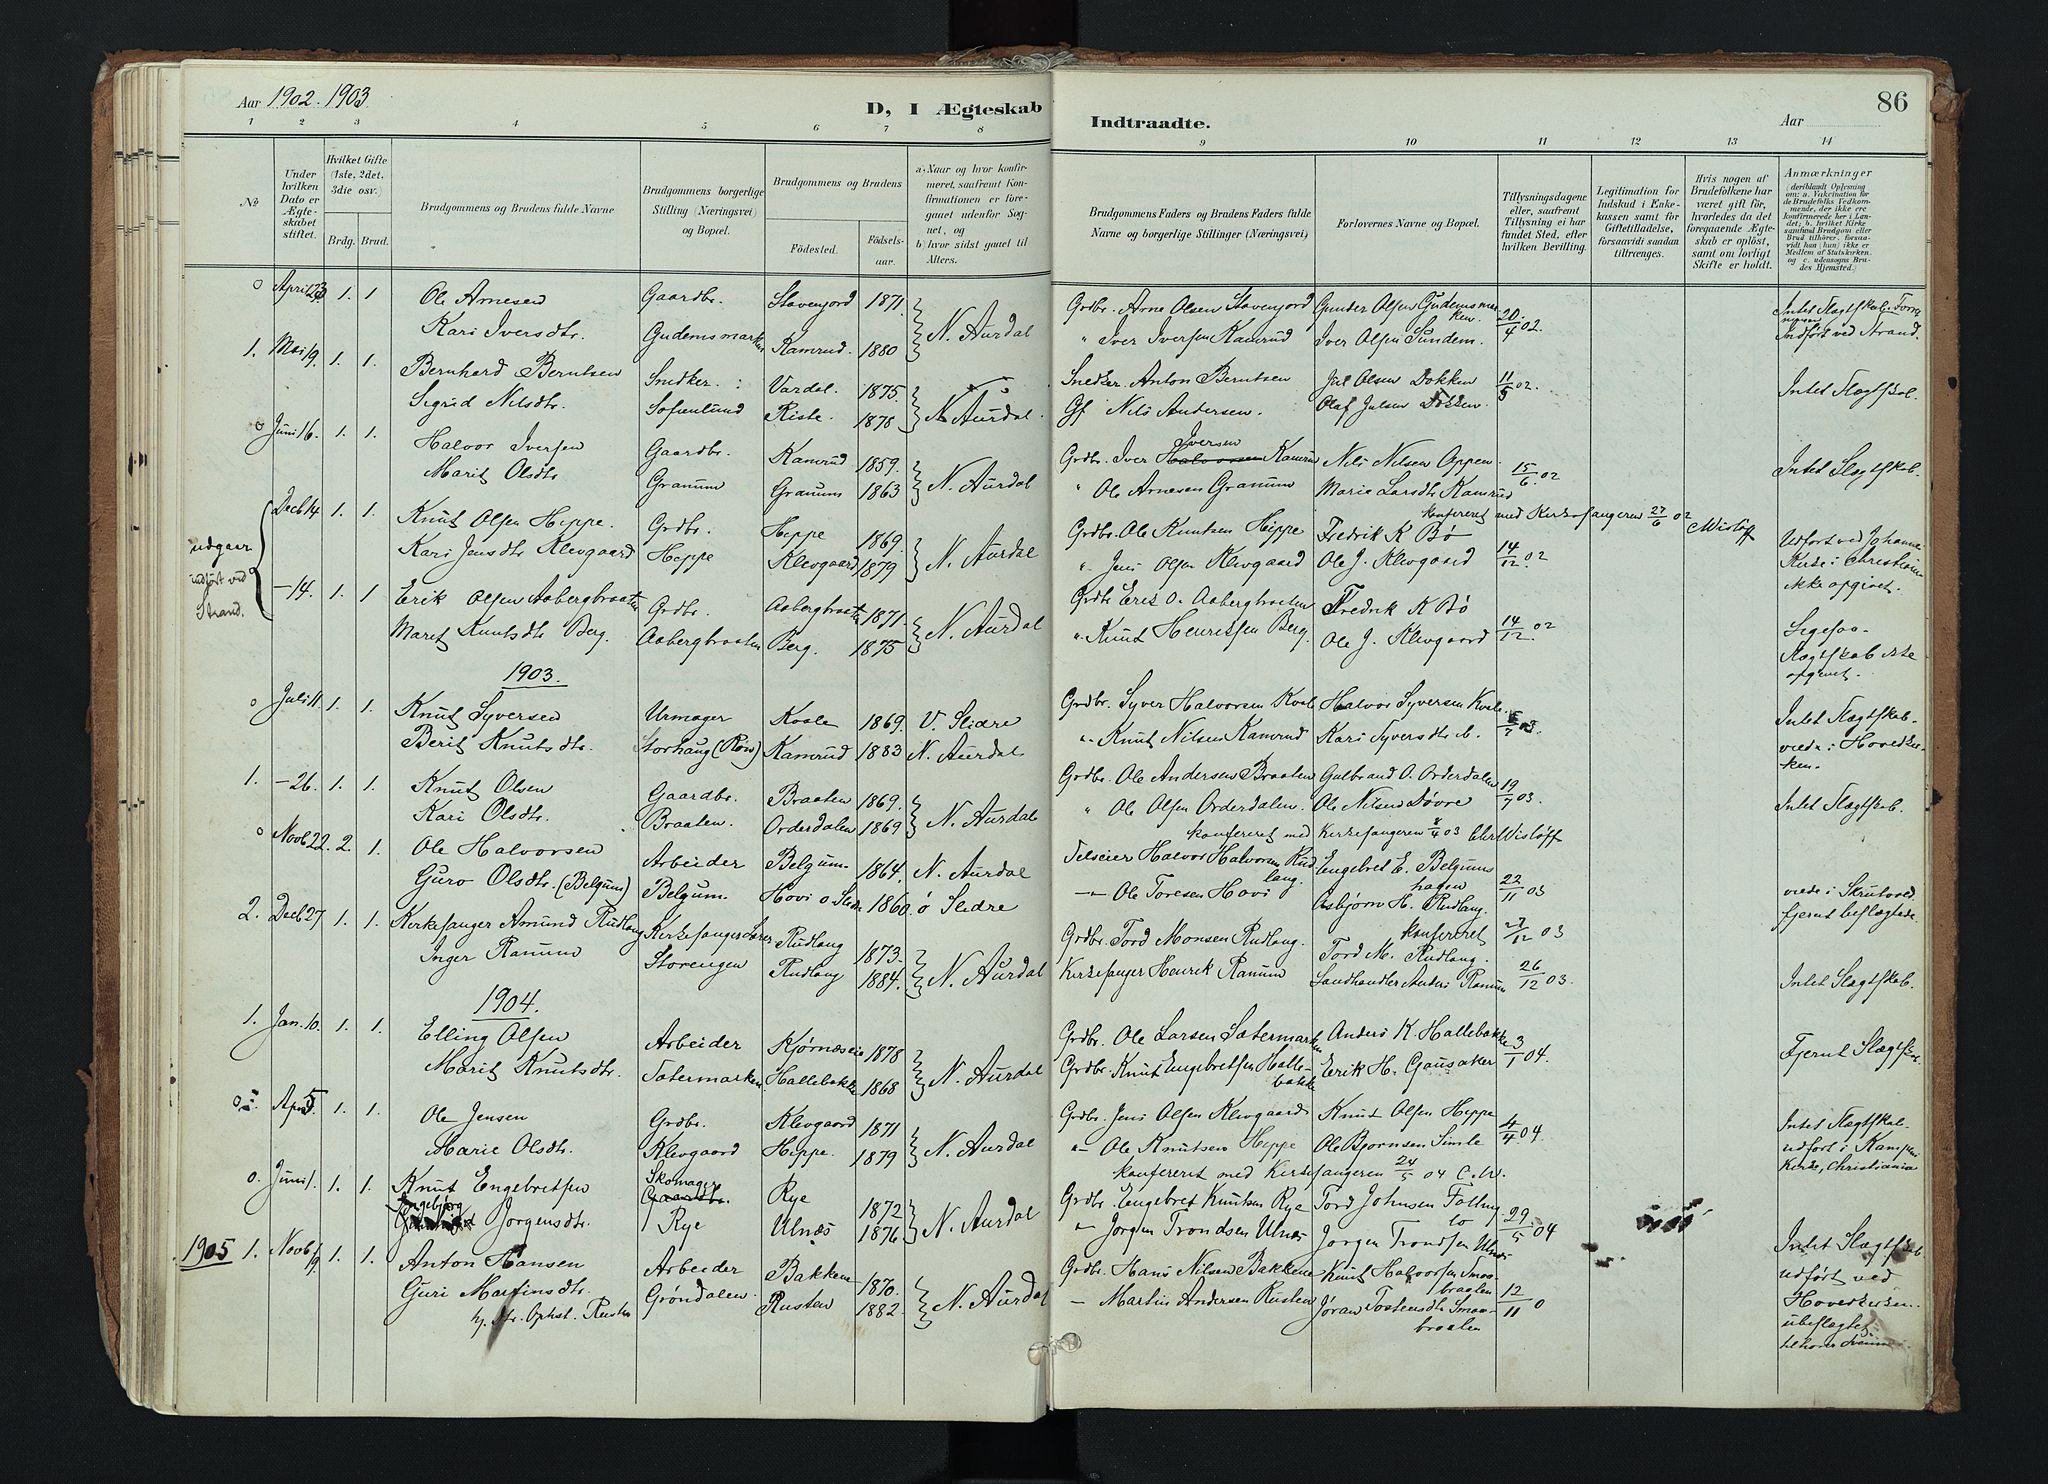 SAH, Nord-Aurdal prestekontor, Ministerialbok nr. 17, 1897-1926, s. 86